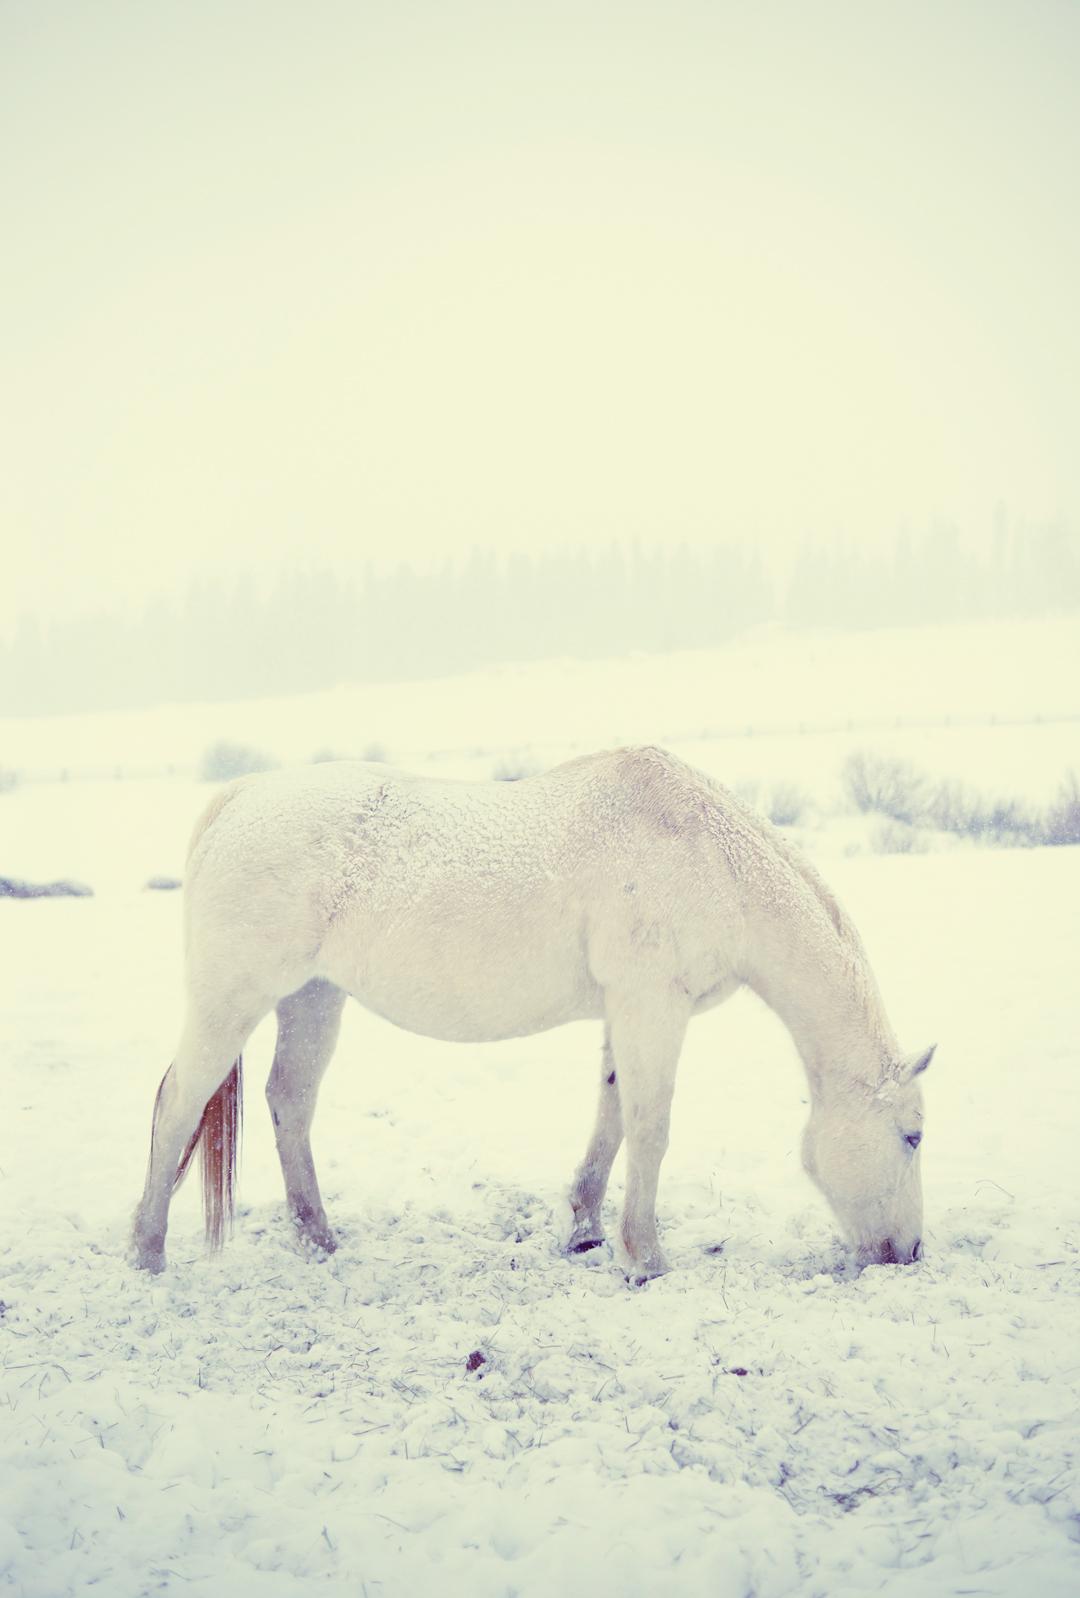 whiteonwhitehorse-copy.jpg